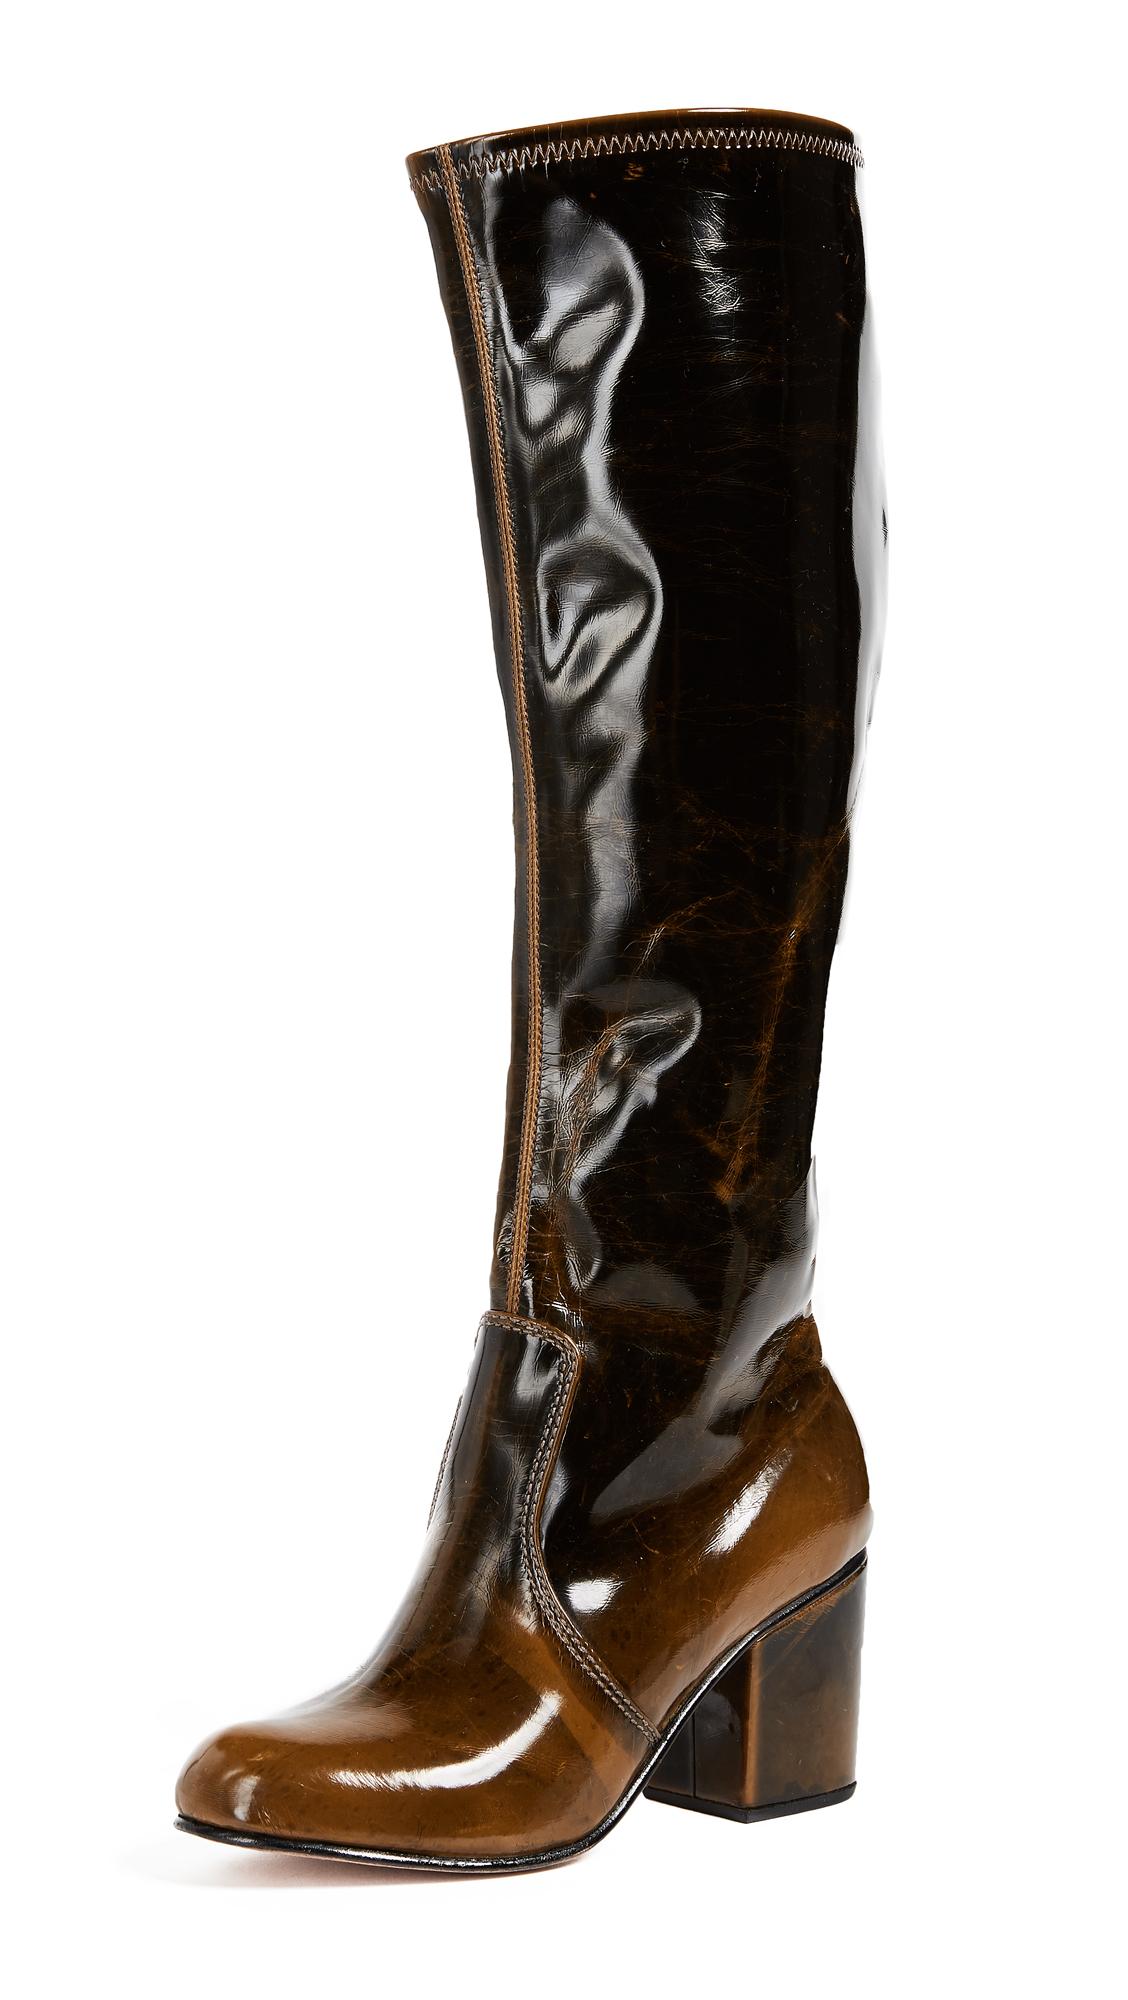 Rachel Comey Braes Knee High Boots - Olive